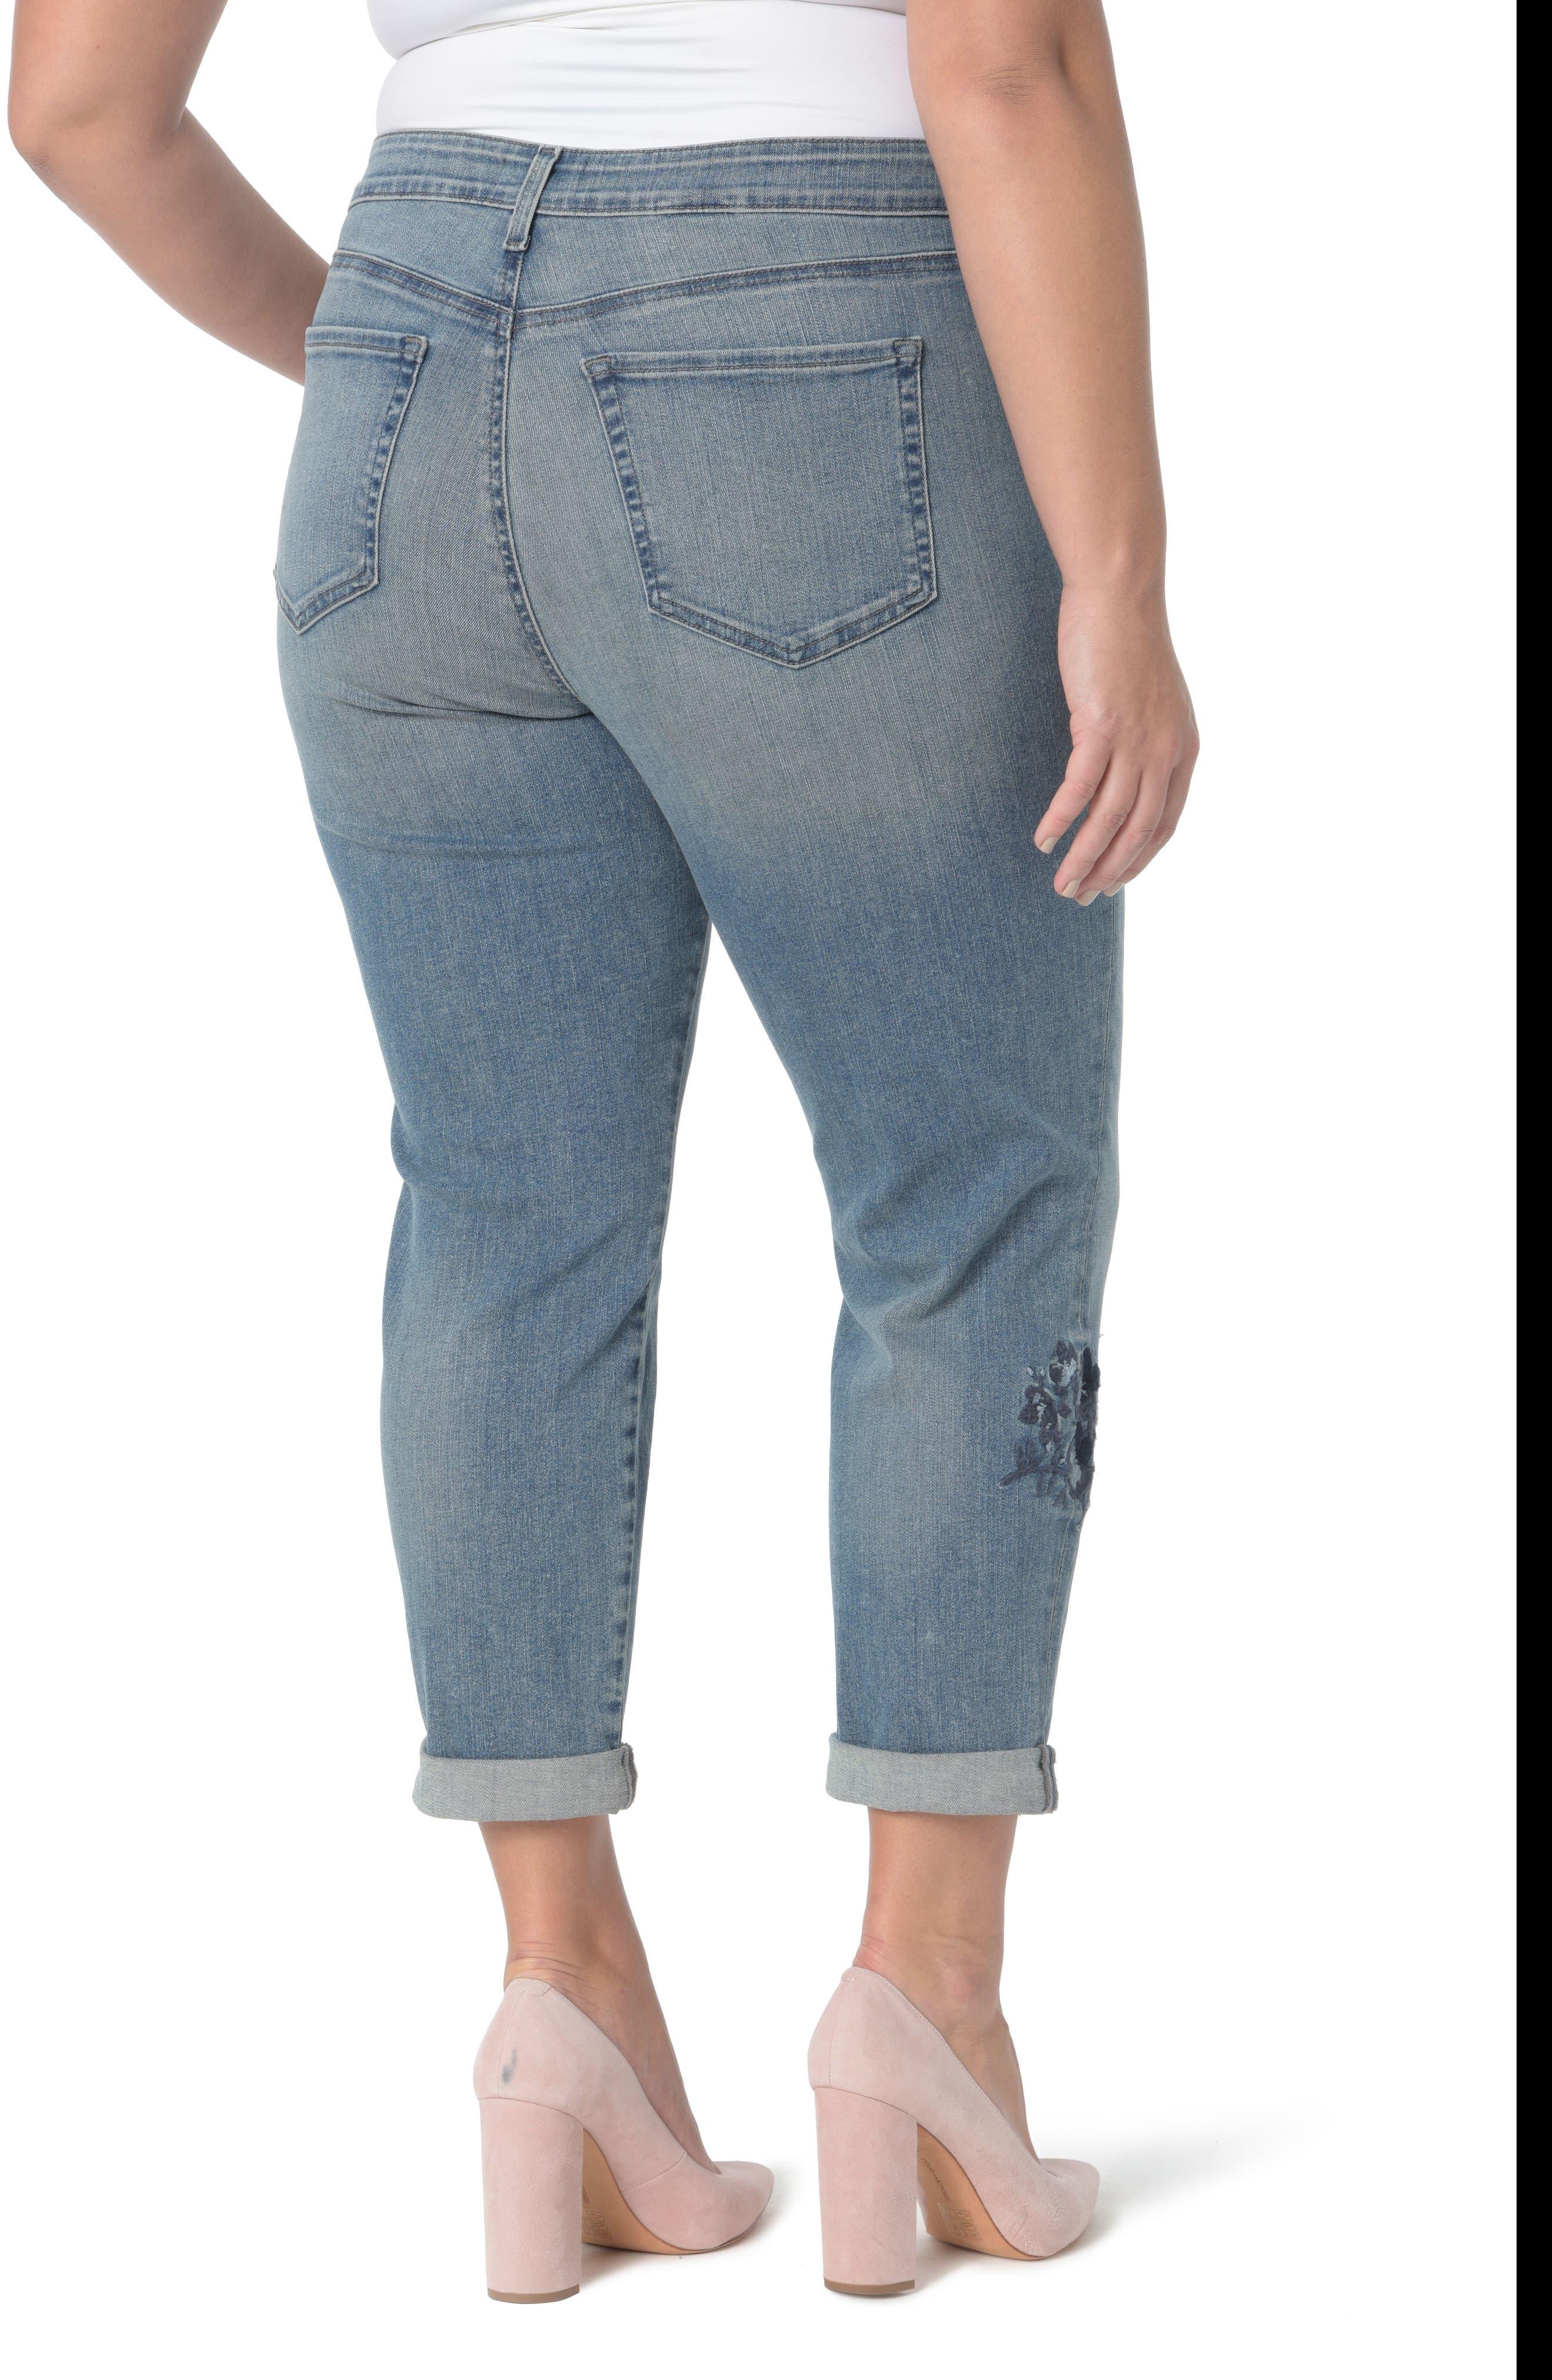 Alternate Image 2  - NYDJ Floral Embroidery Boyfriend Jeans (Pacific) (Plus Size)